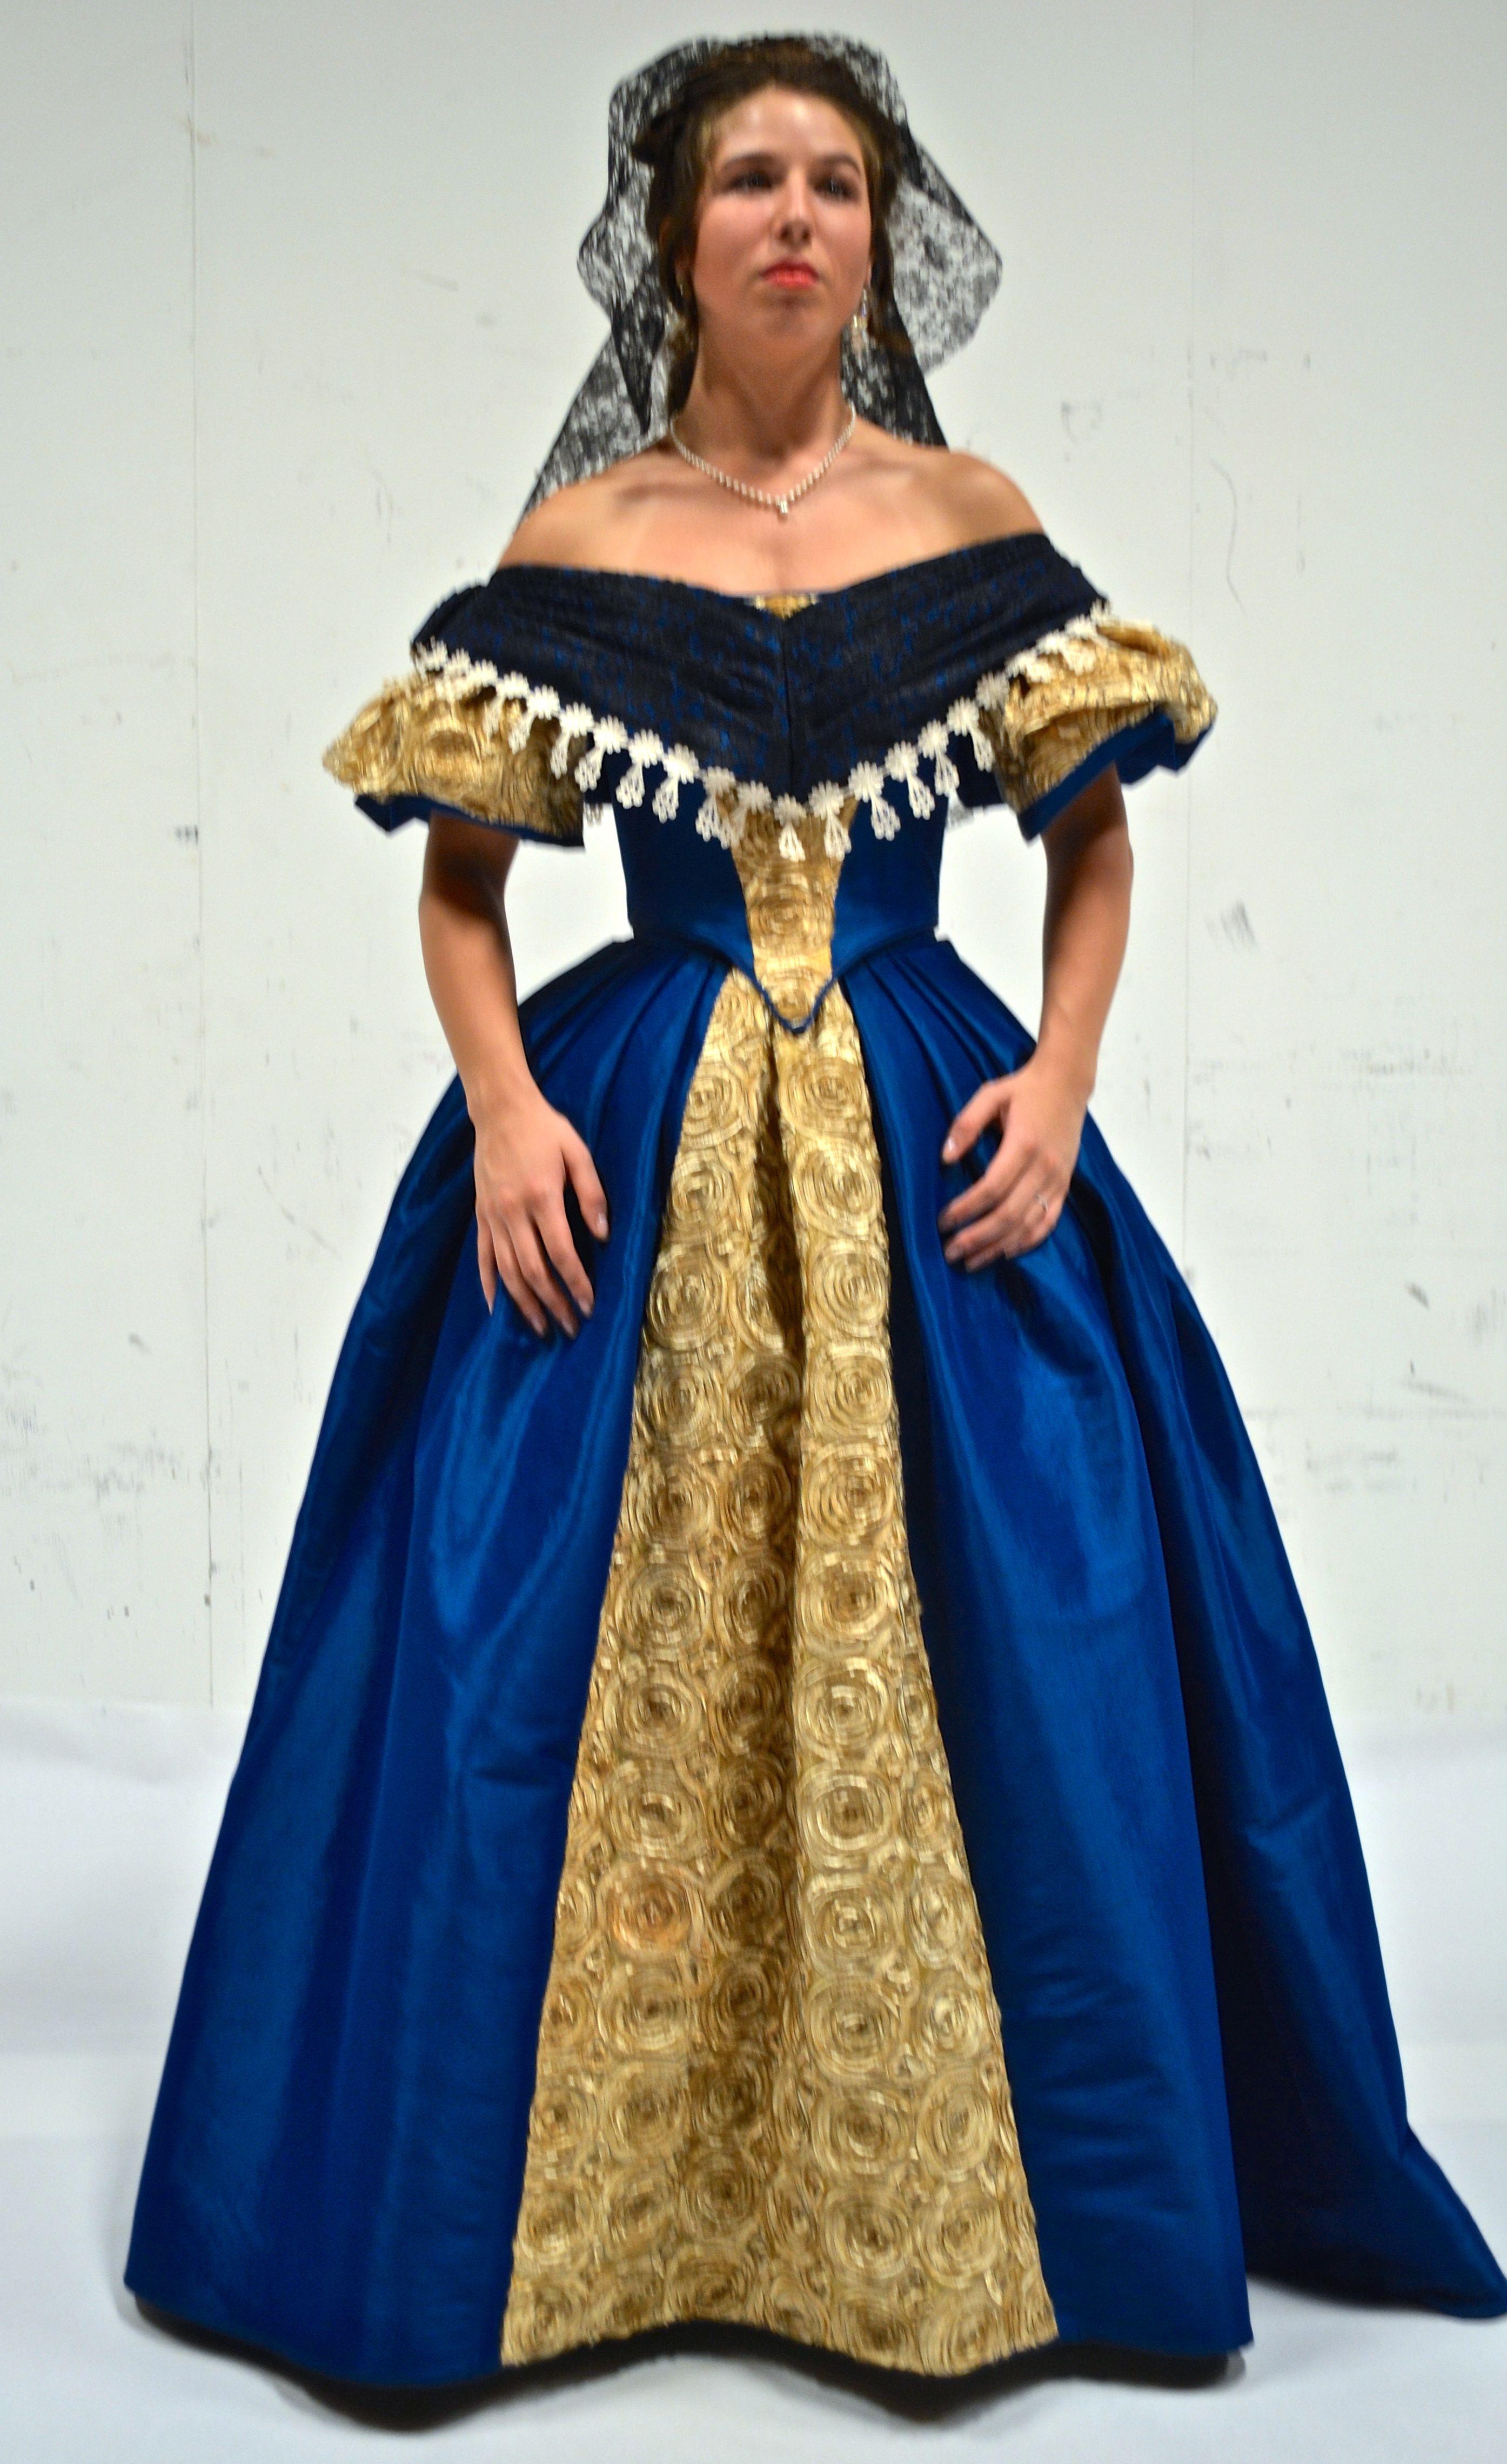 Lady Capulet. | Lady Capulet | Pinterest | Lady